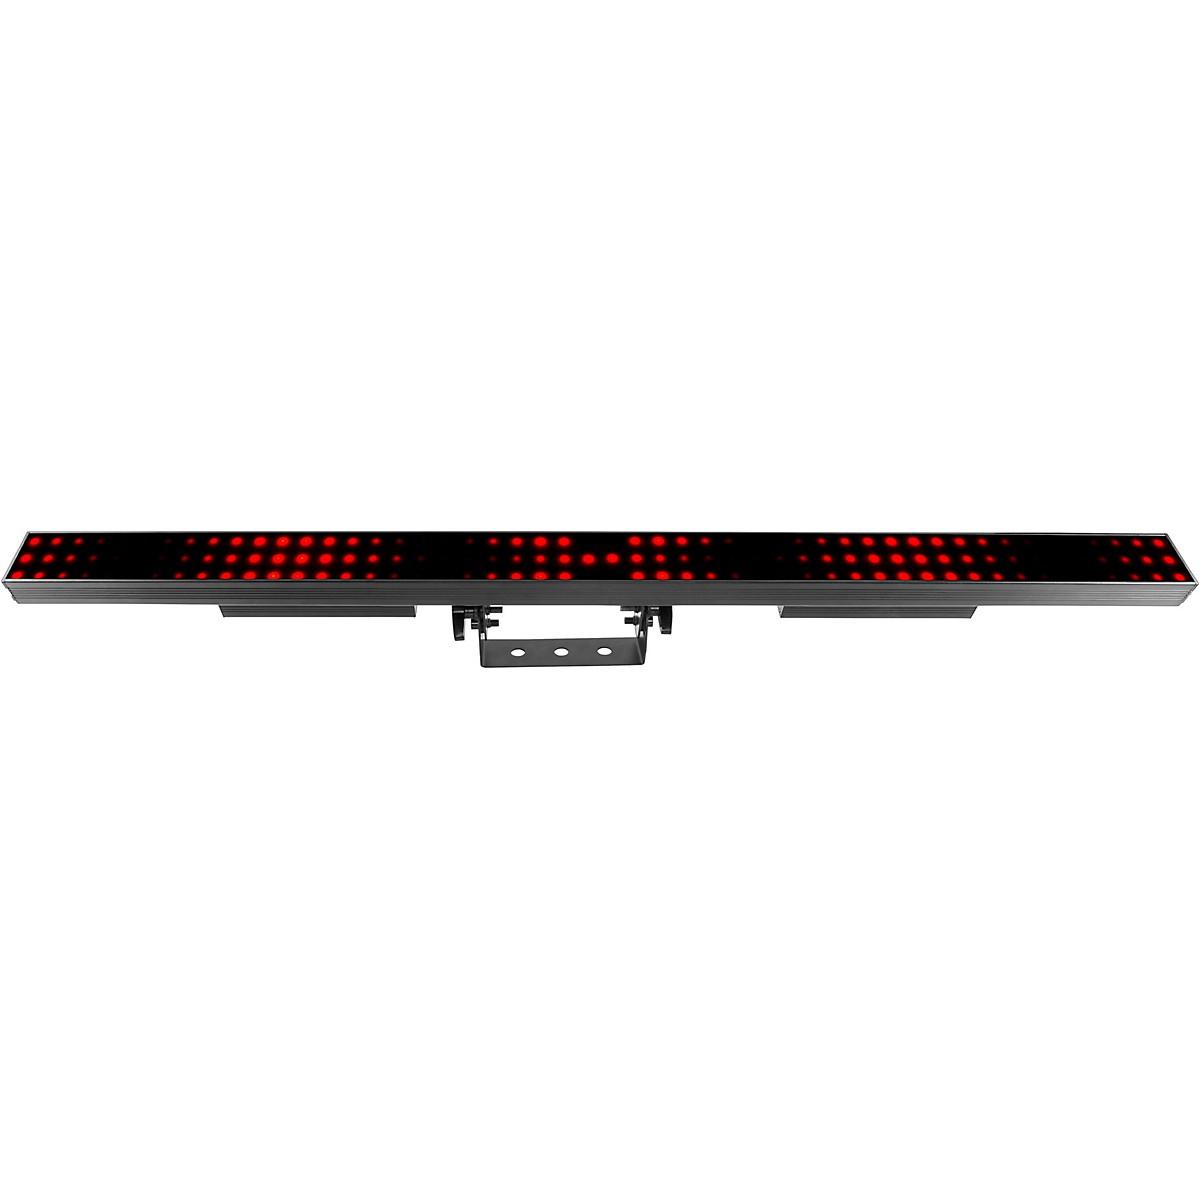 CHAUVET Professional Epix Bar Tour Pixel-mapping LED Bar